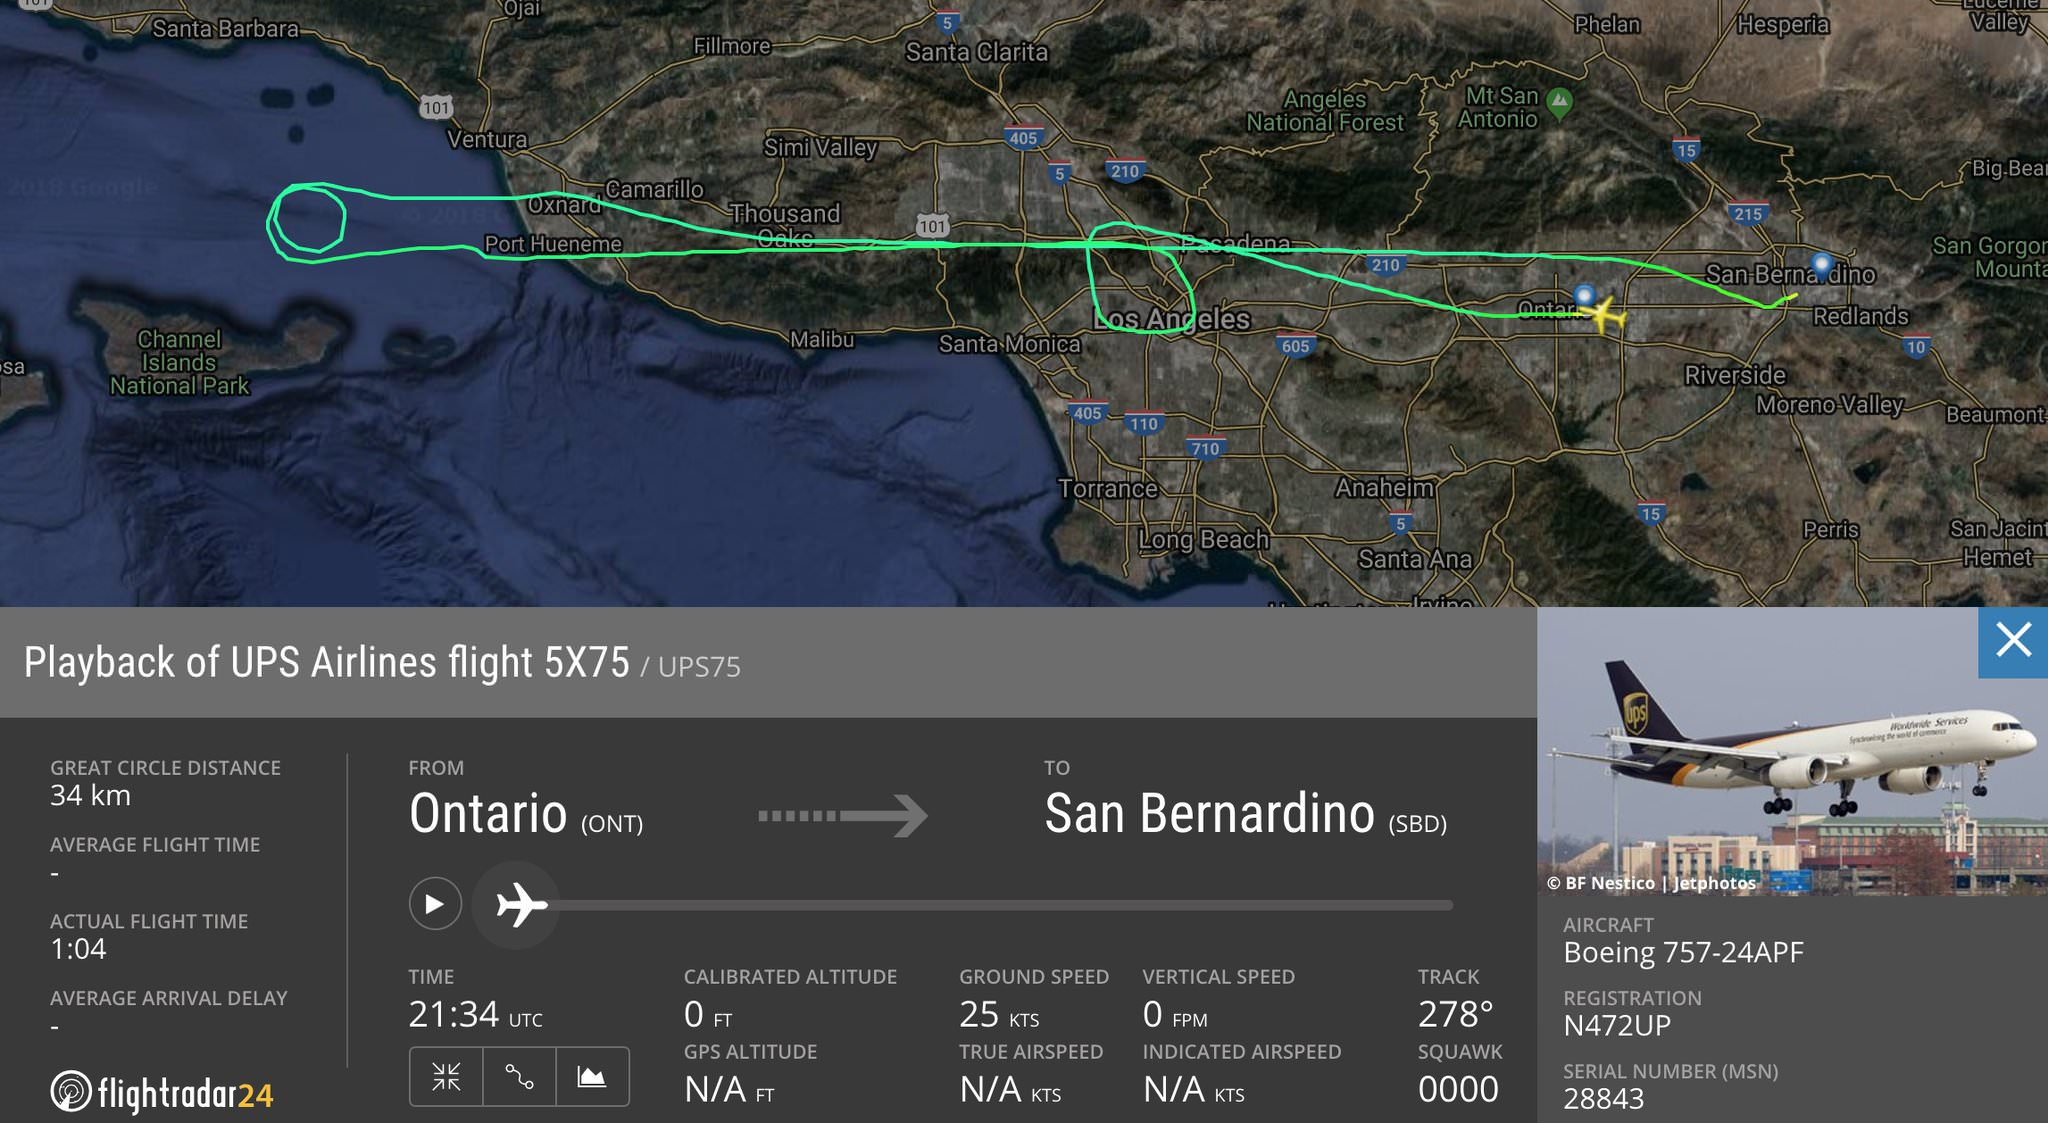 UPS 757 LA Photo Flight